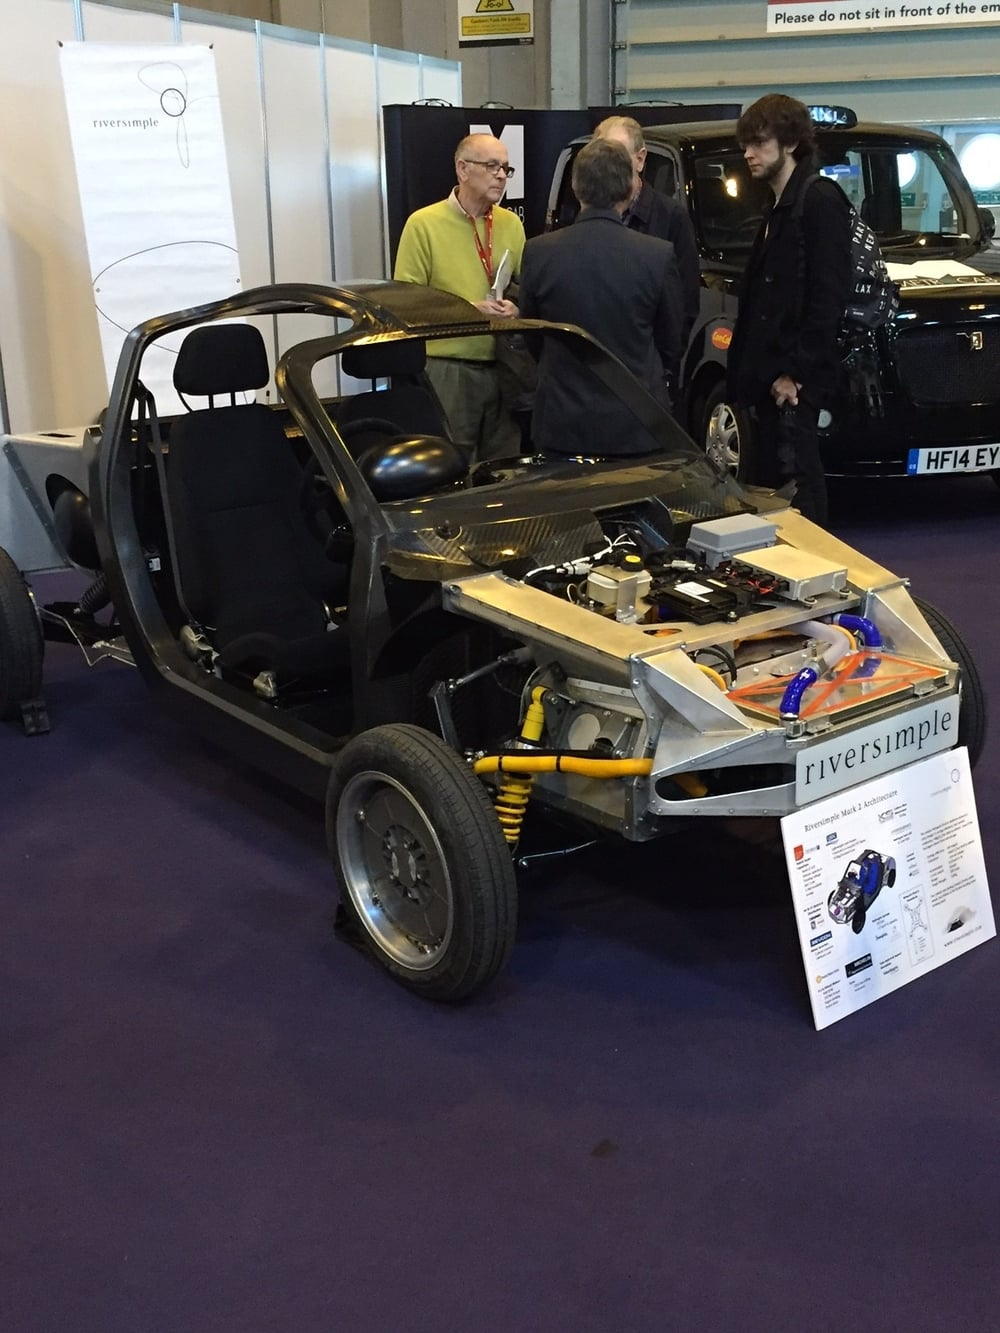 District Designs - hydrogen fuel cell car Riversimple